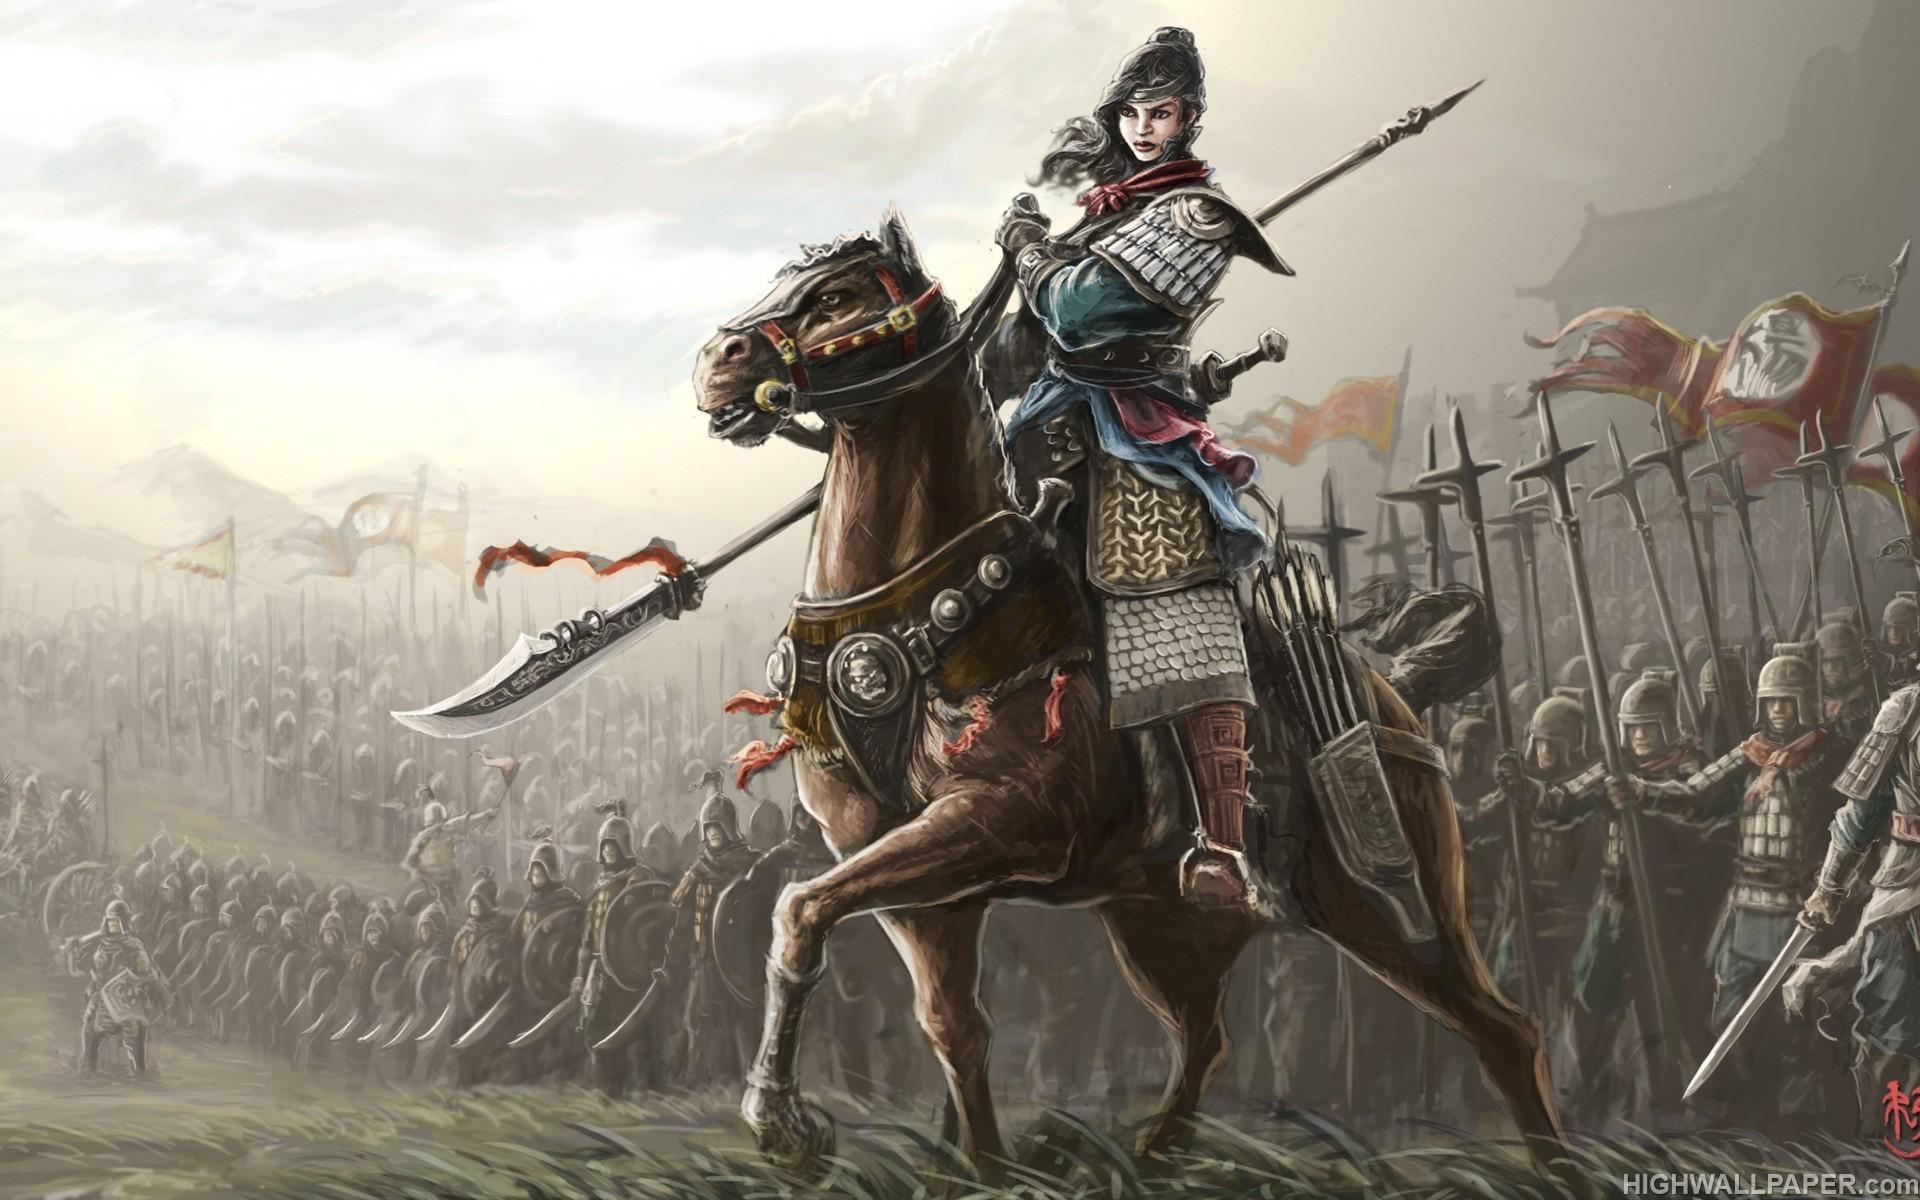 Knights Templar Wallpaper Iphone Lady Warrior On Horse Hd Wallpaper